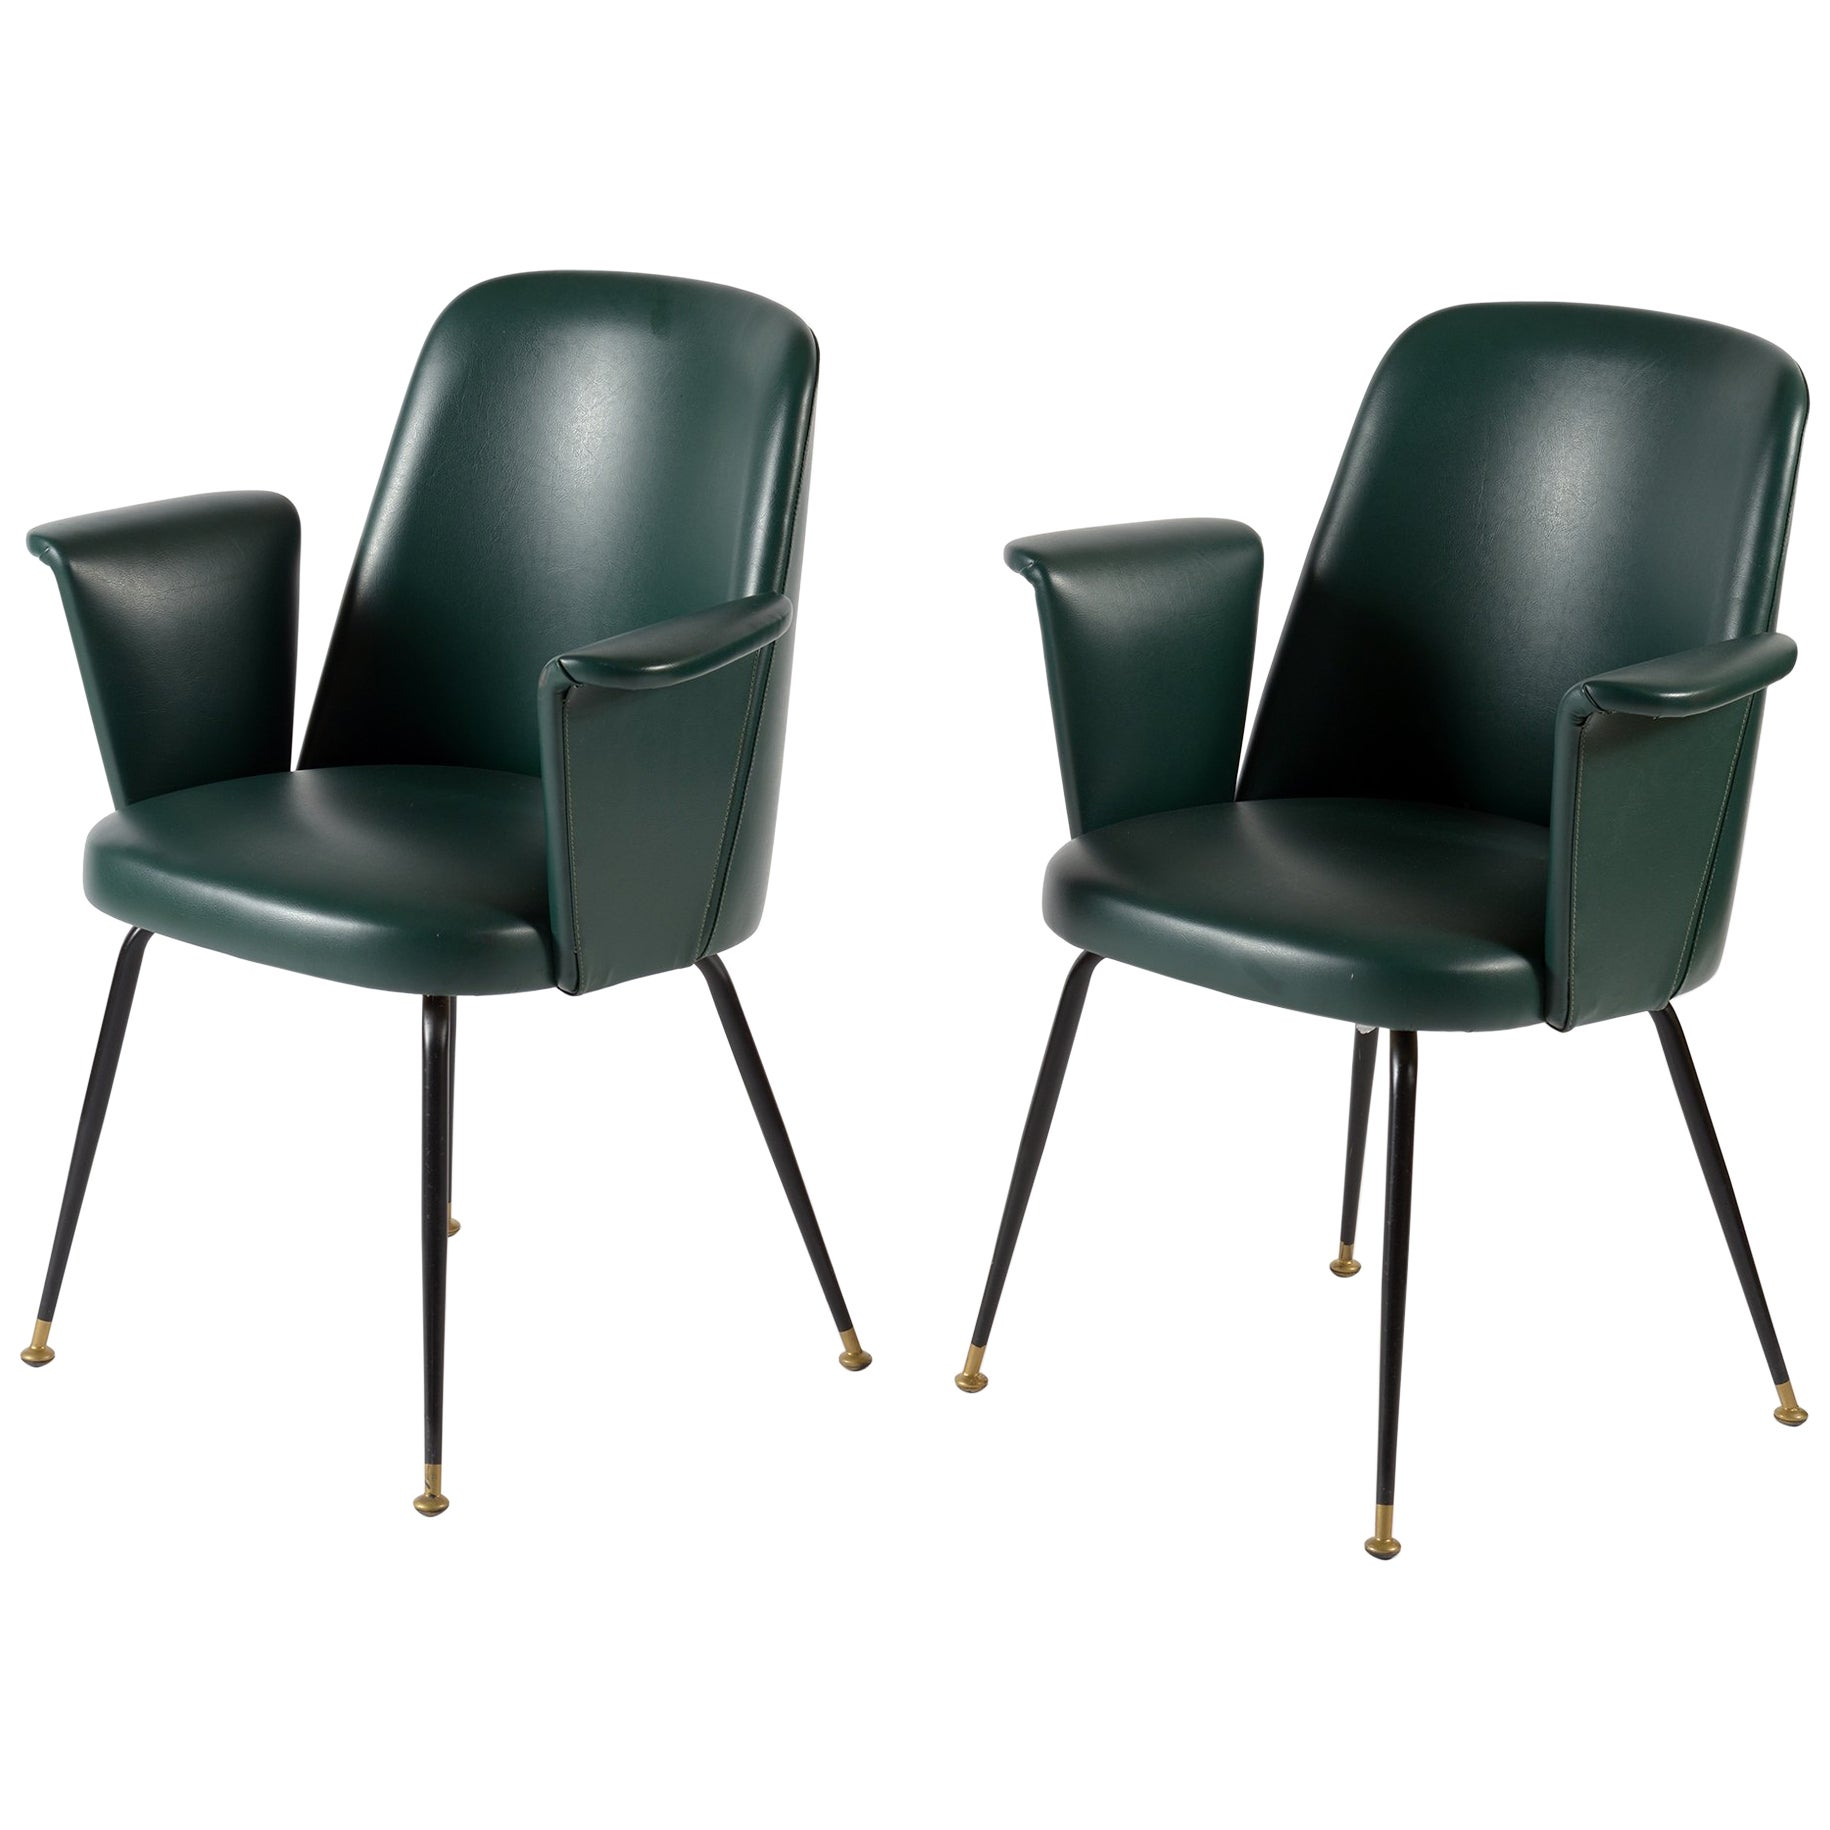 Midcentury Italian Pair of Chairs Brass Leggs Green Original Leatherette, 1950s